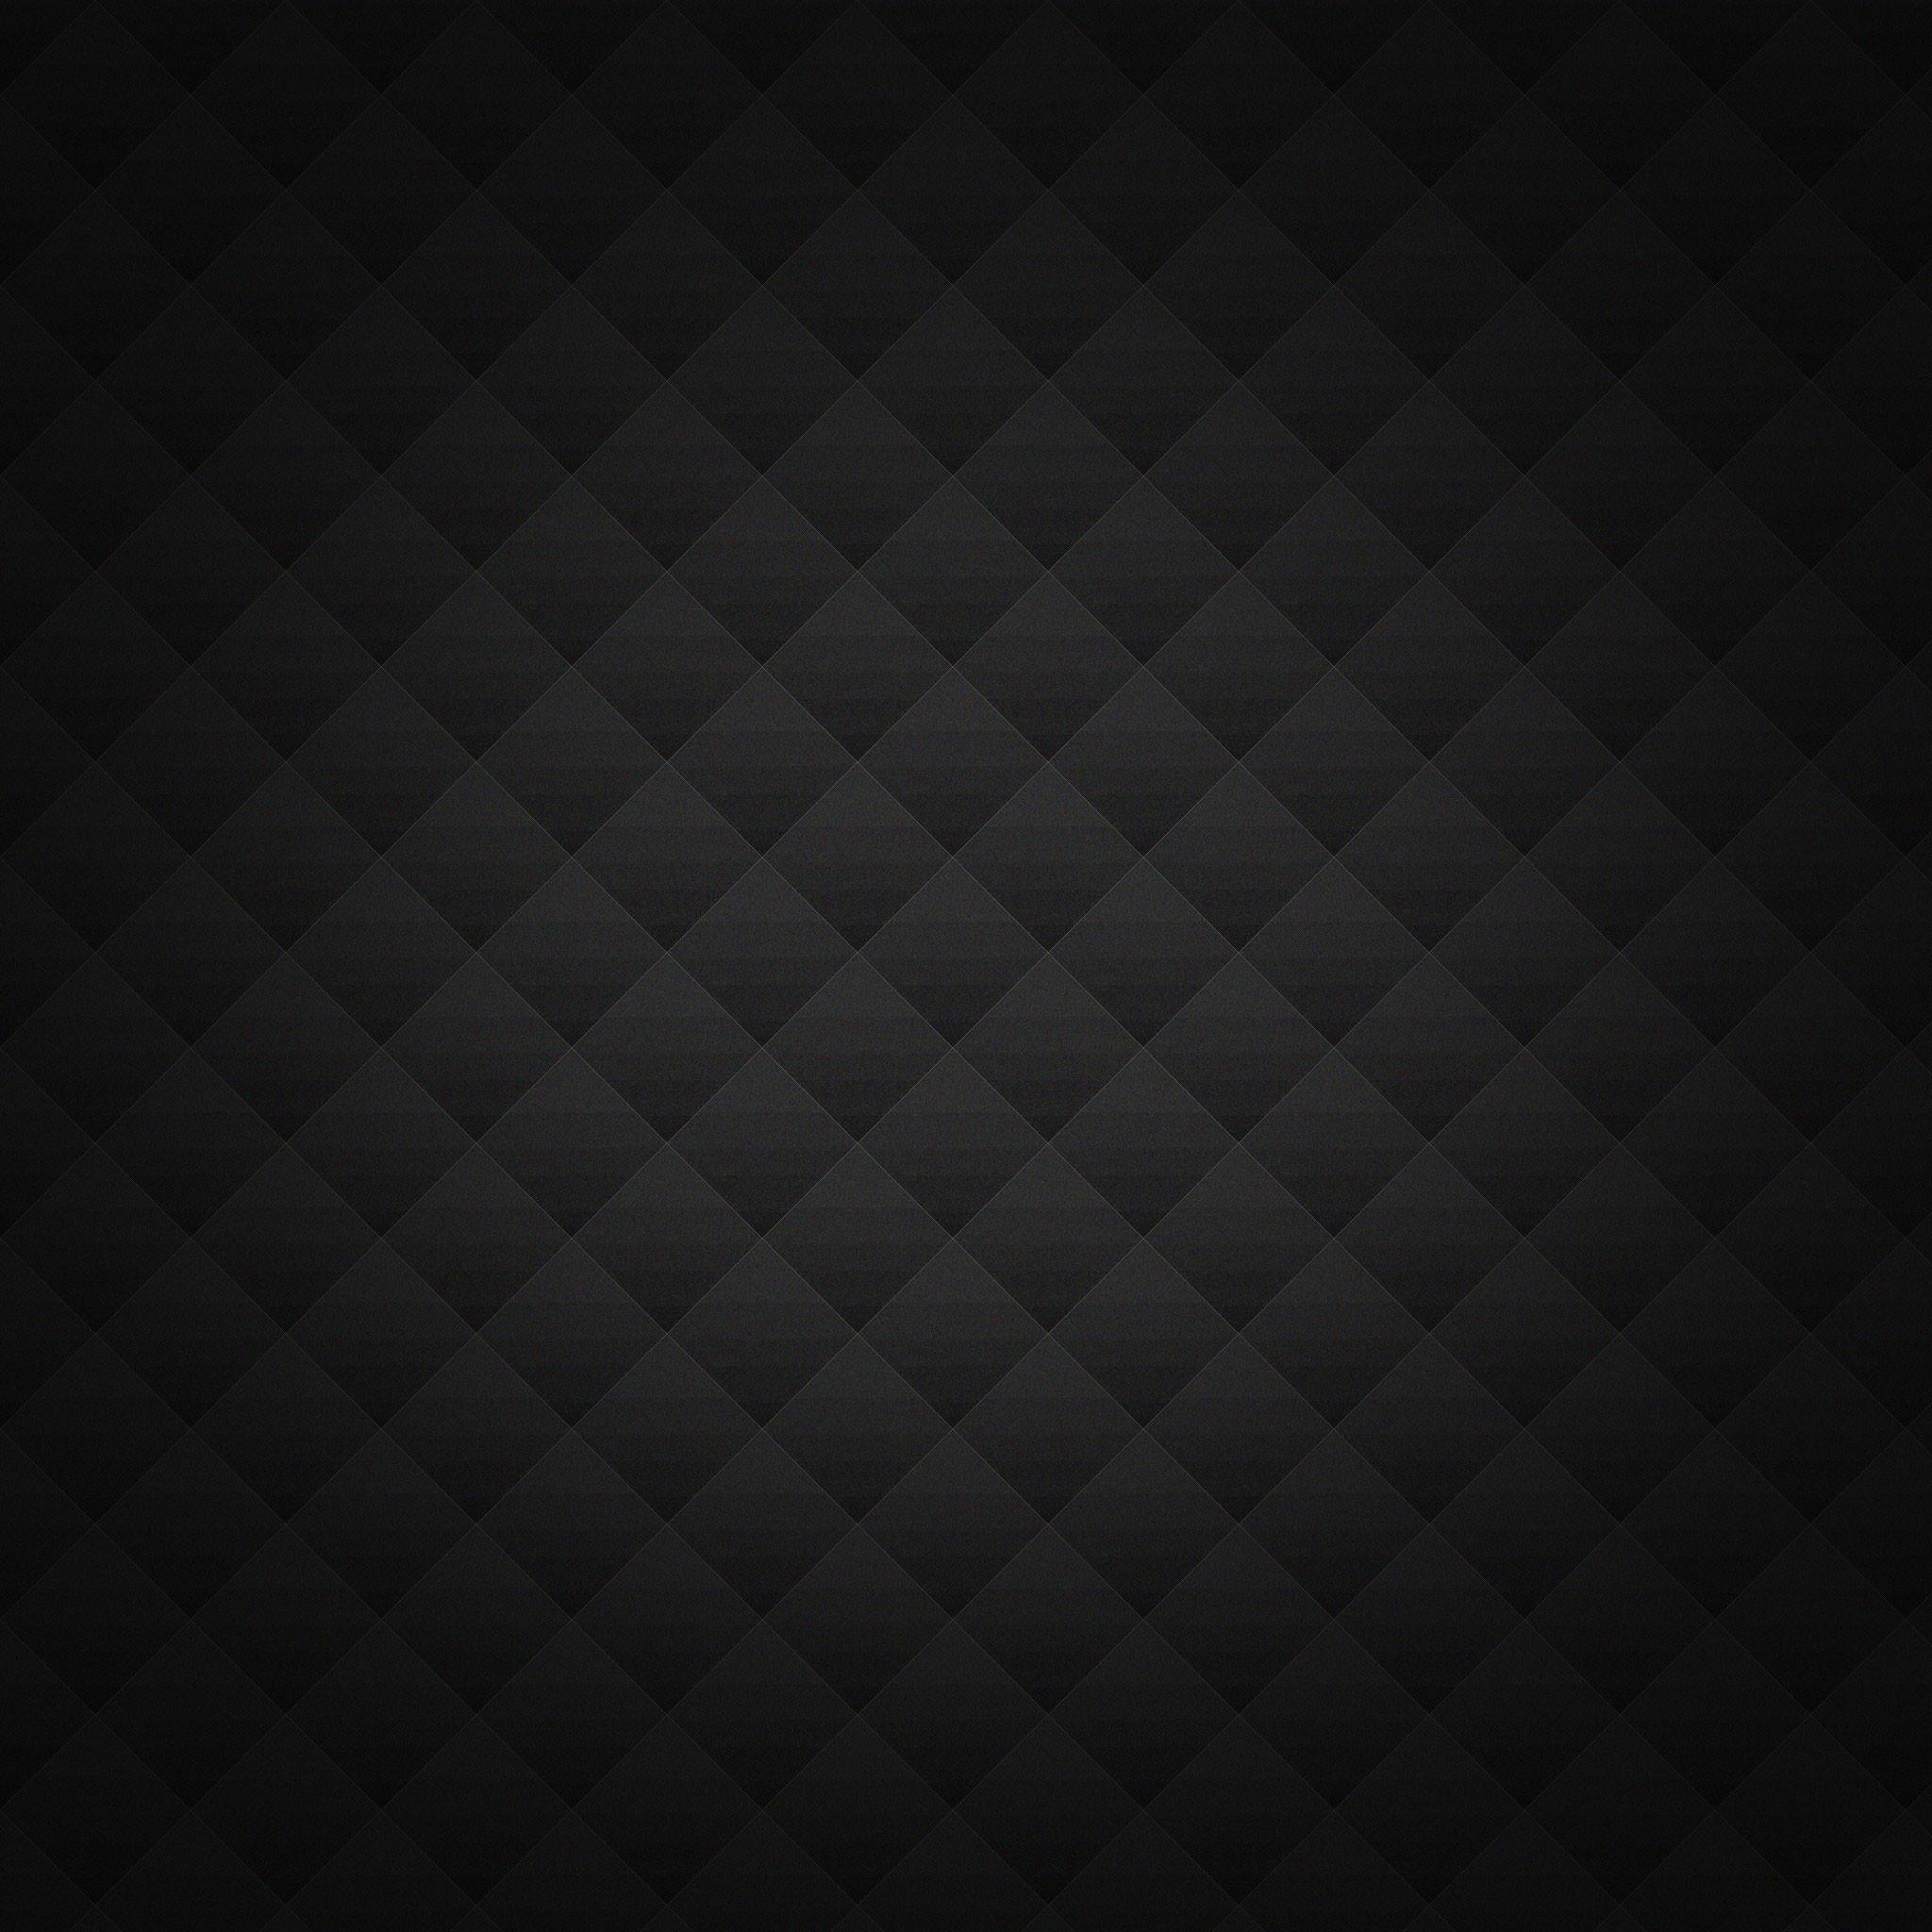 Tablet iPad 3 2048×2048 wallpapers (96 Wallpapers)